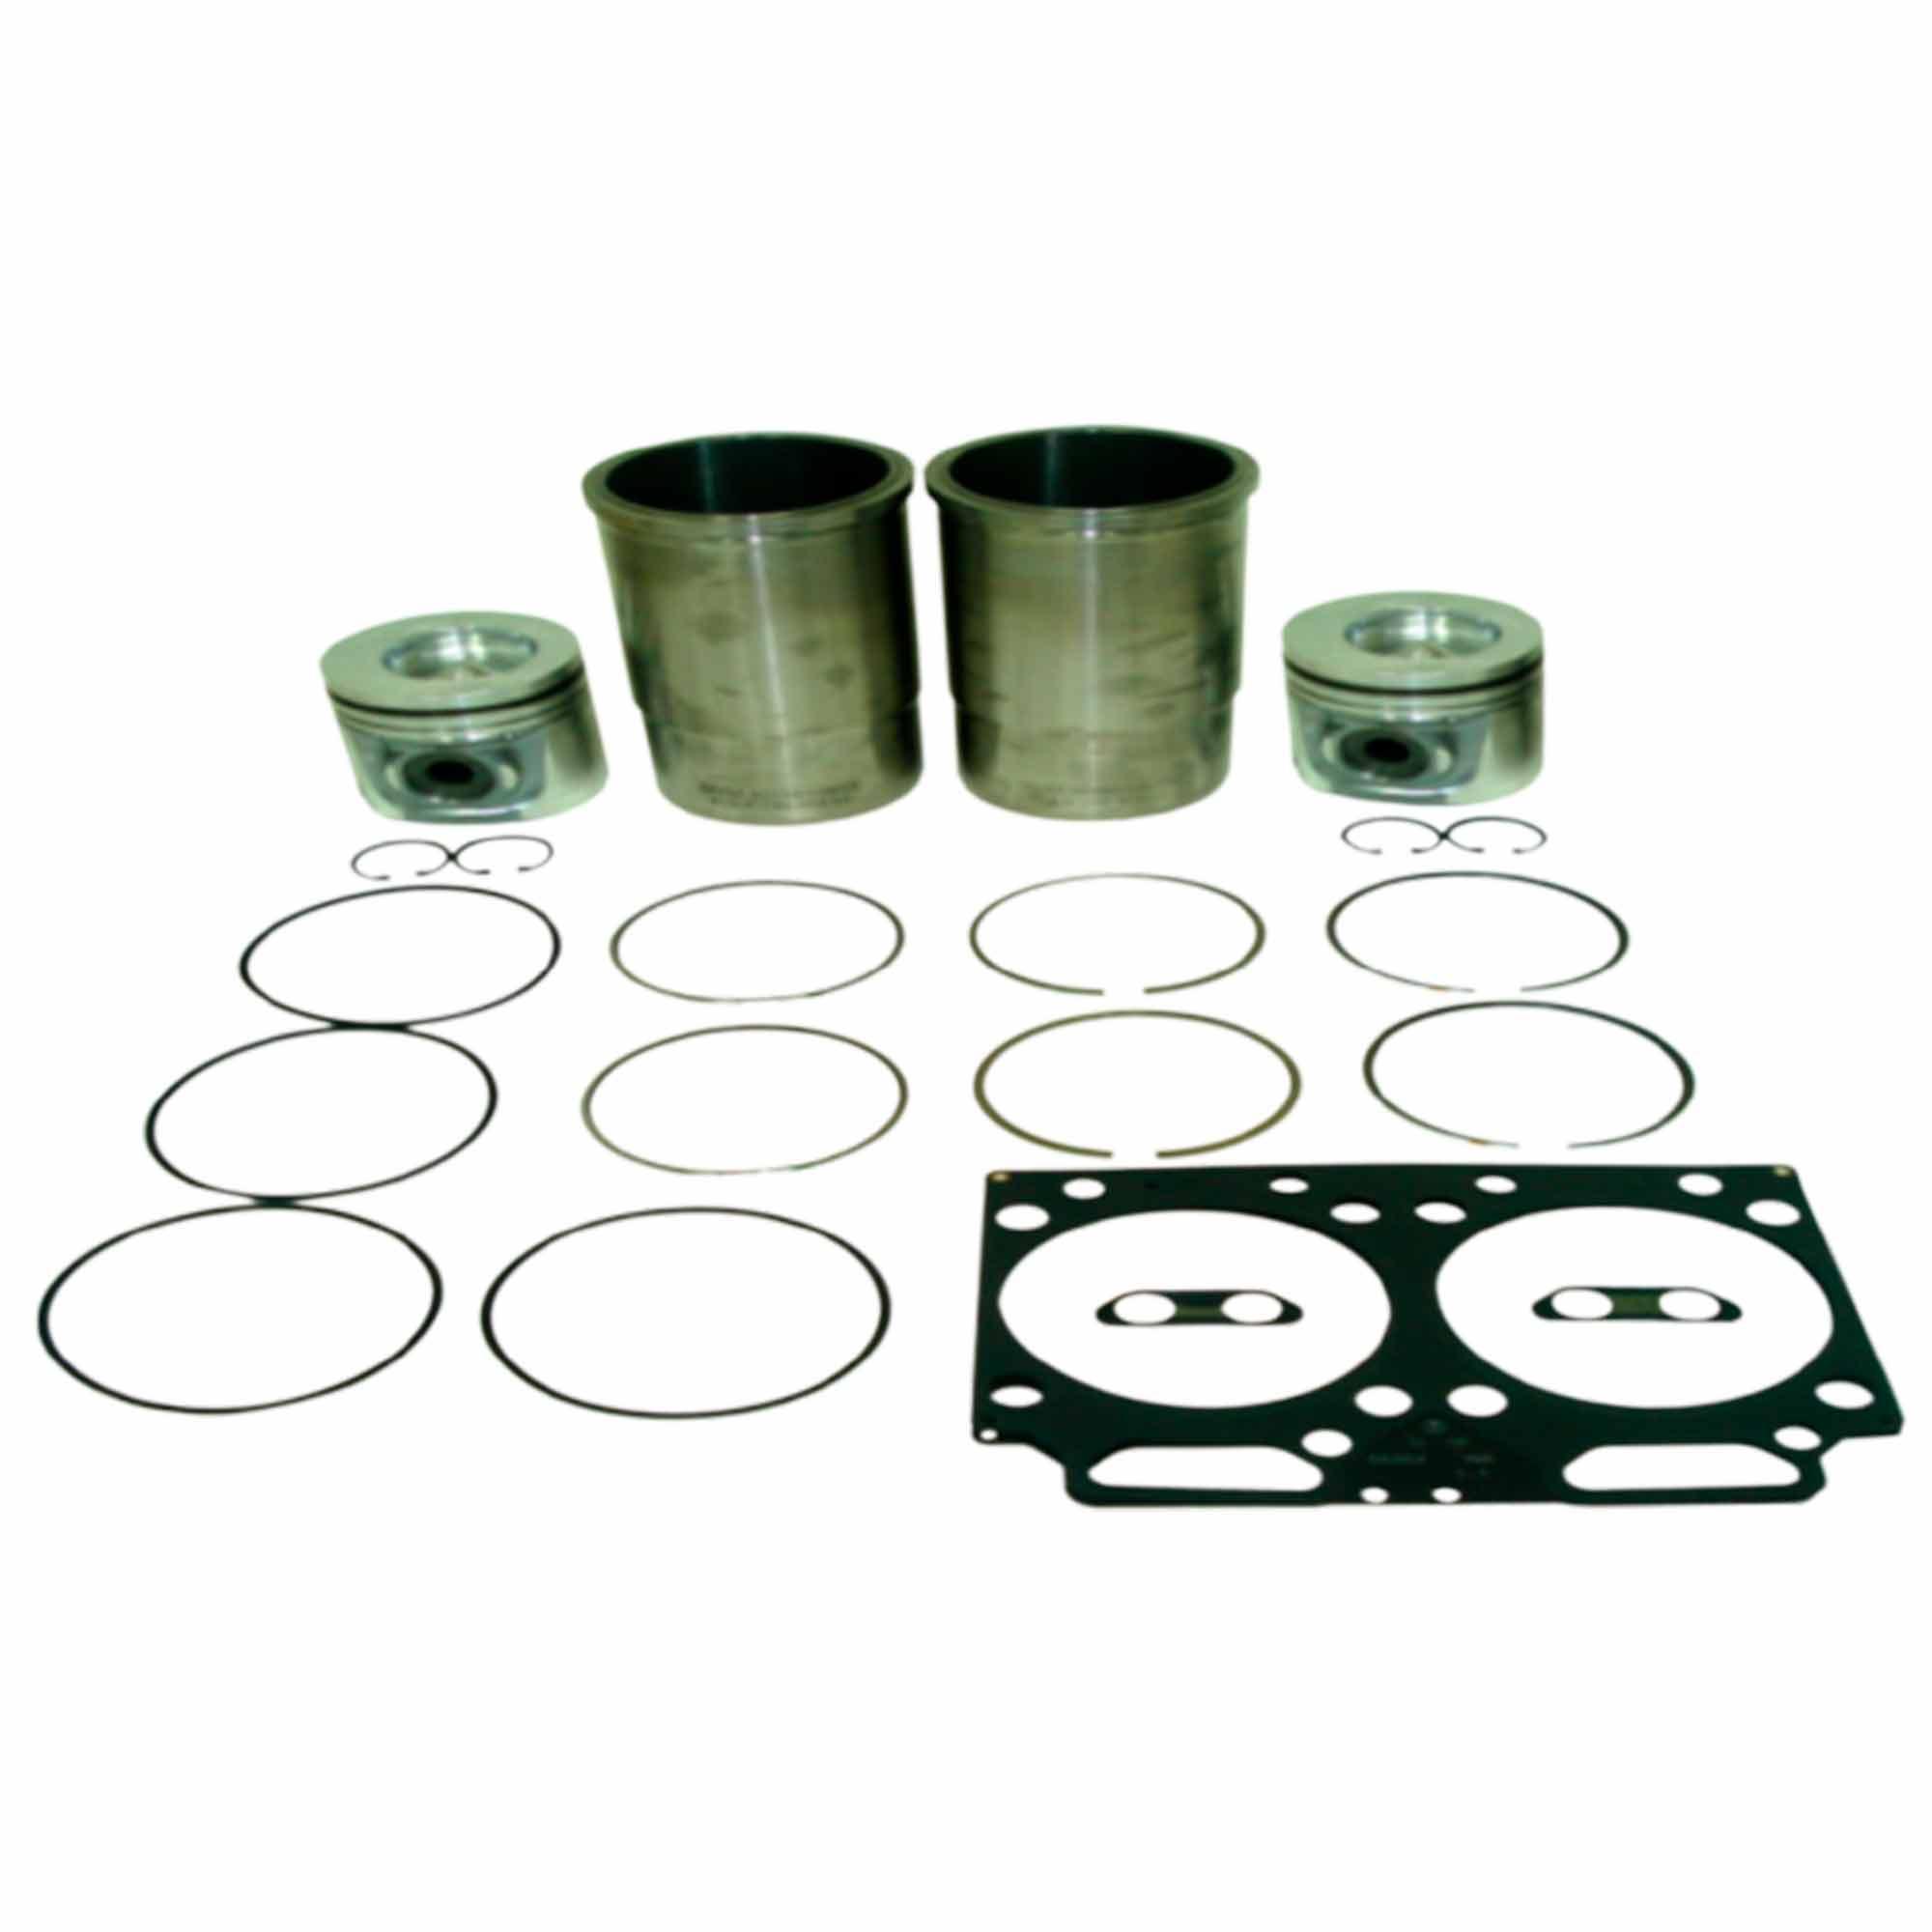 961280190128 - Kit de reparo para 2 cilindros - MWM